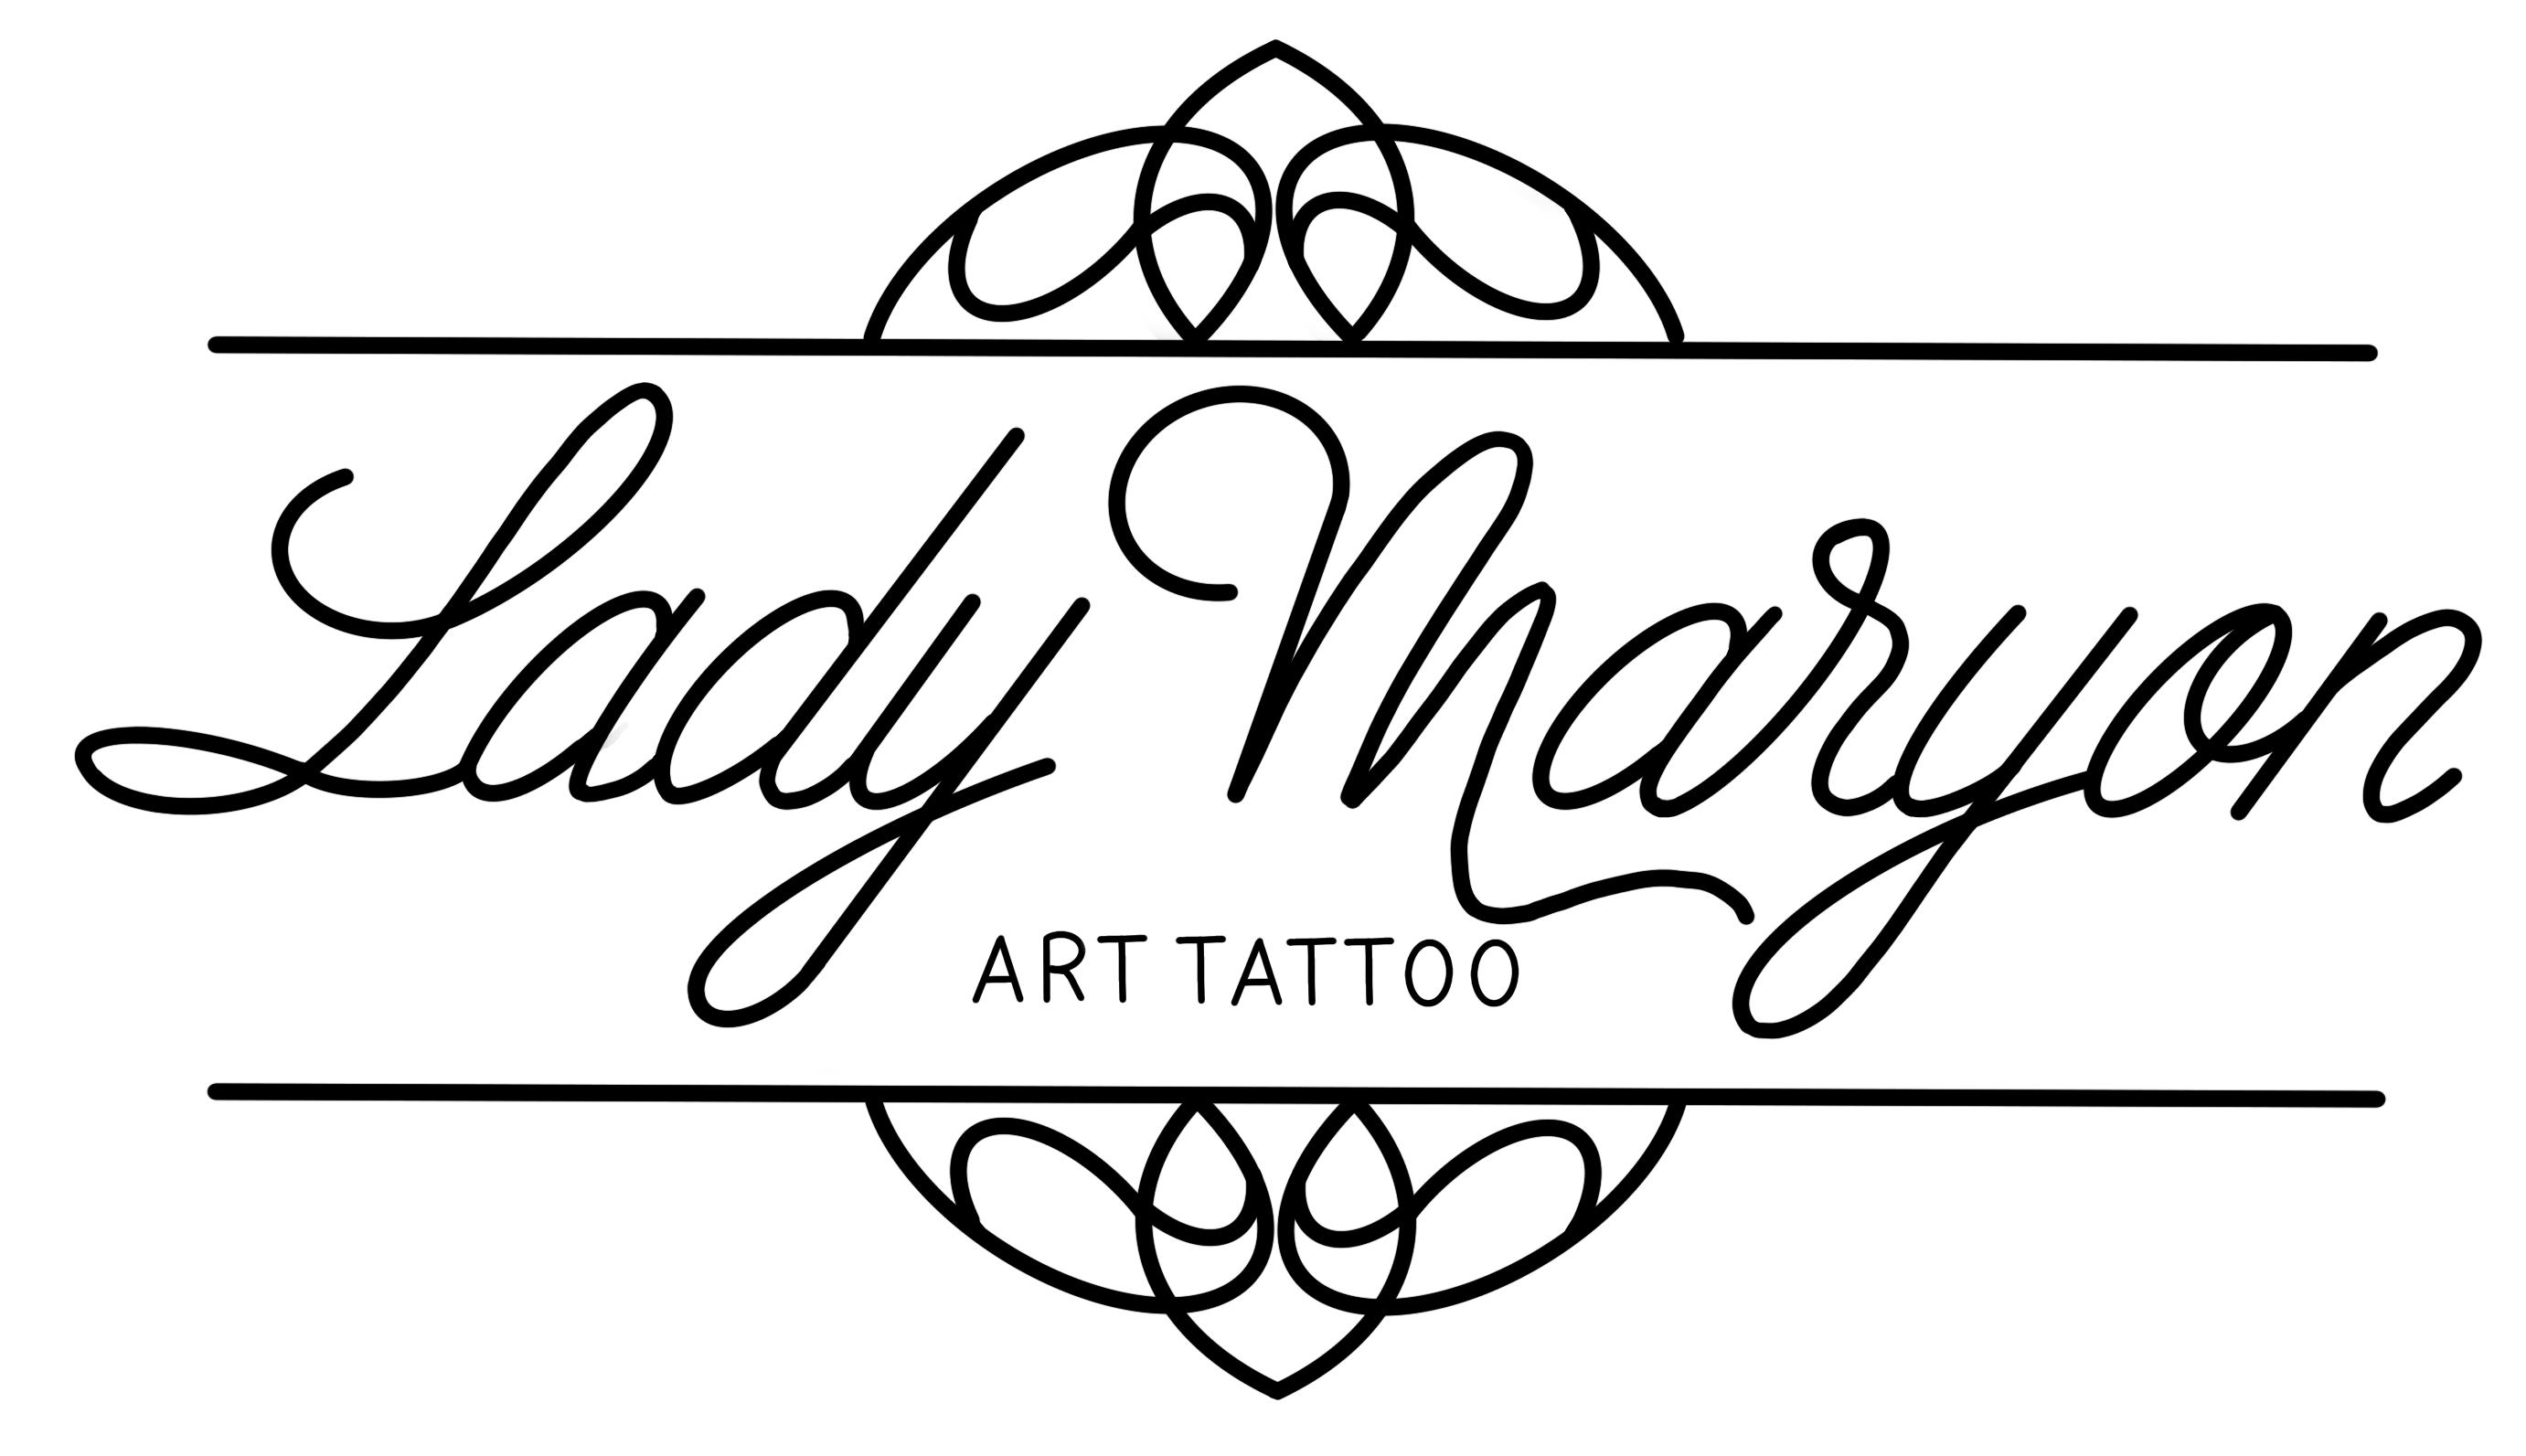 Lady Maryon Art Tattoo